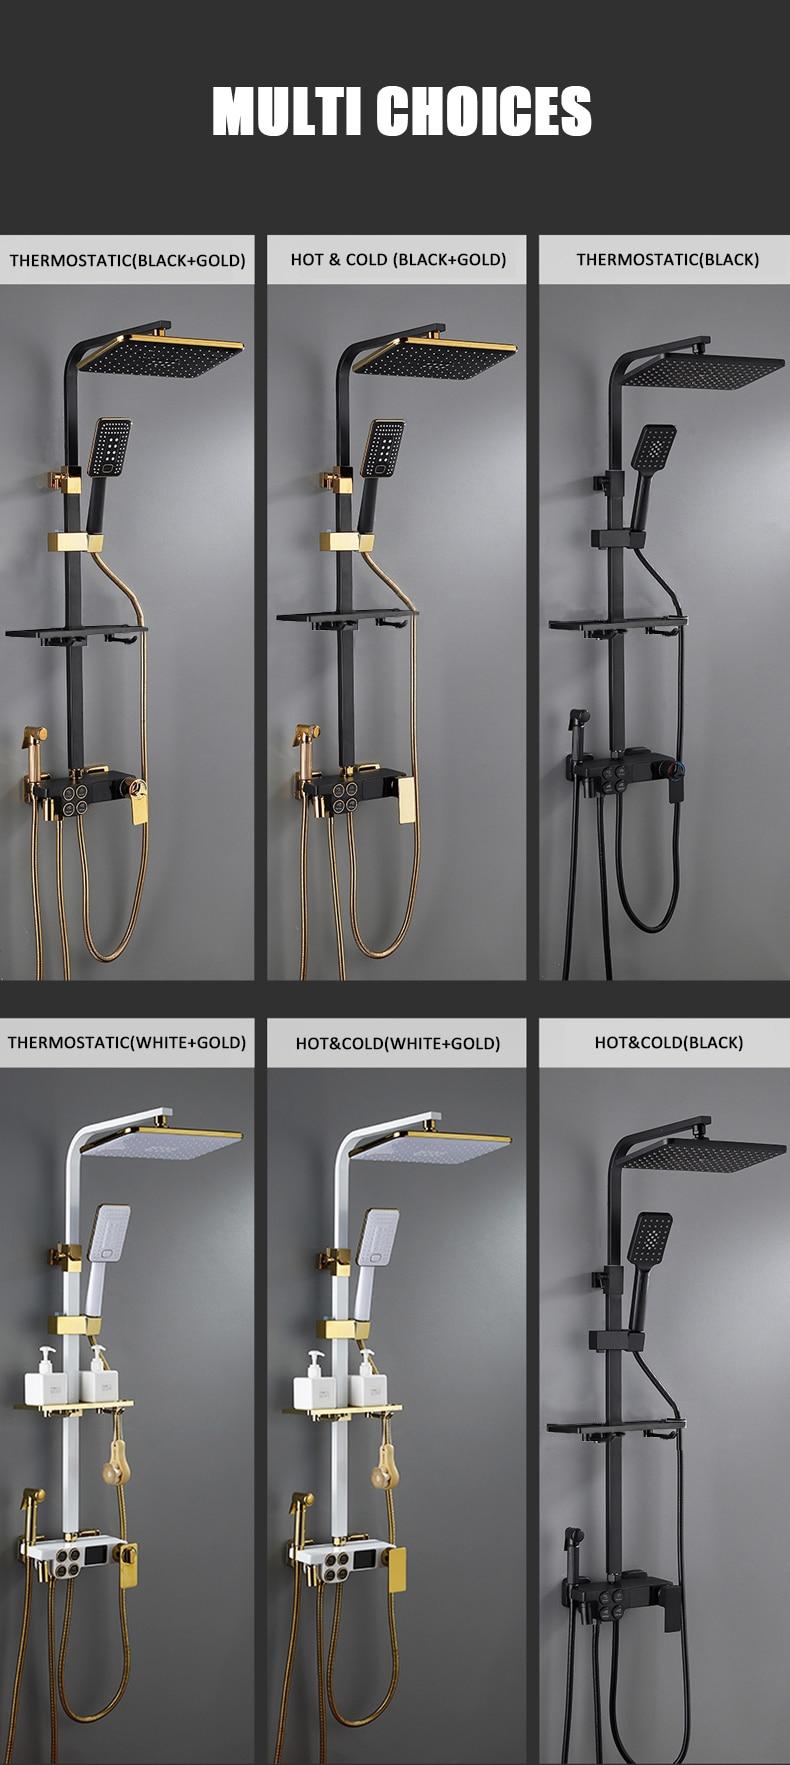 Hf76f83fbe1f74c588a4845320982a9f7G Hot Cold Shower System Bathroom LED Digital Shower Set Wall Mount Smart Thermostatic Bath Faucet Square Head SPA Rainfall Grifo